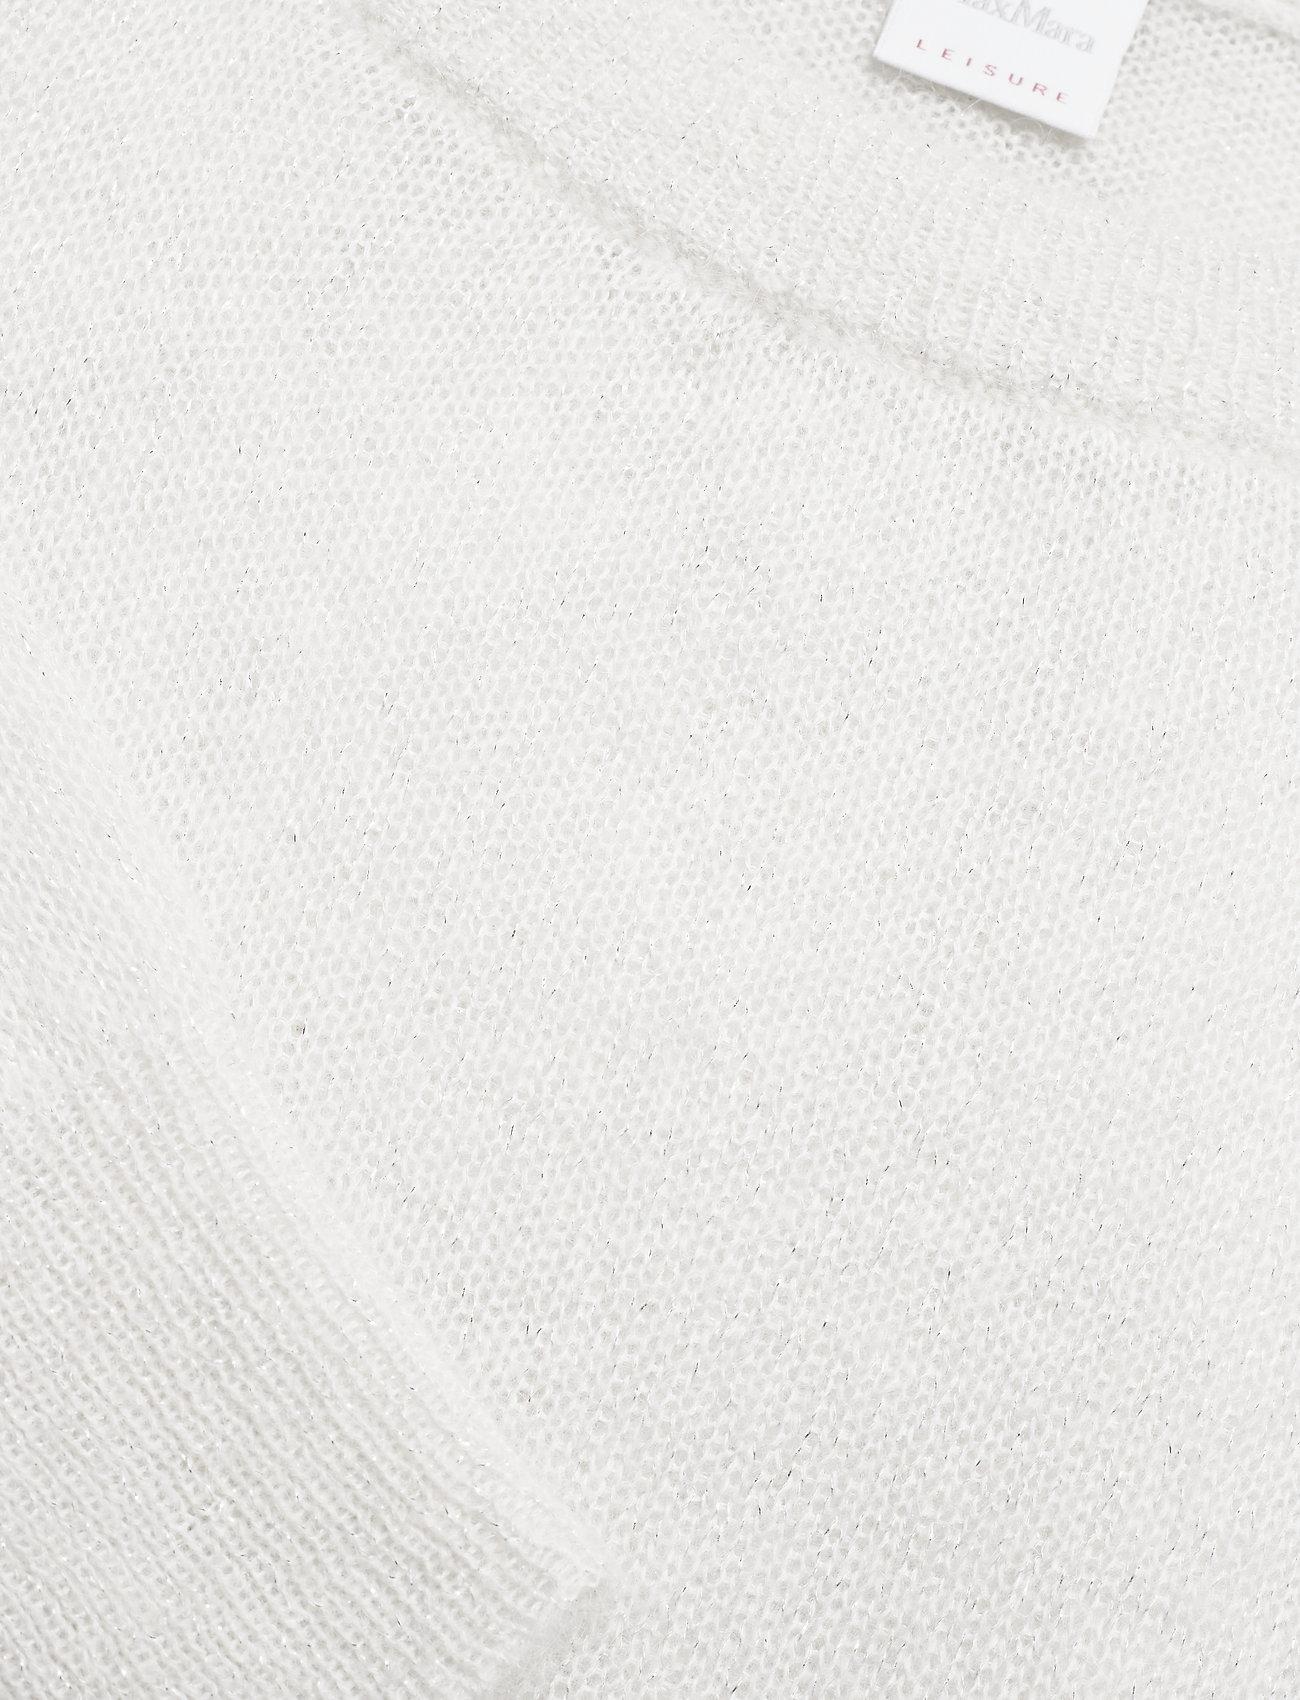 Max Mara Leisure - PILADE - sweaters - white - 2